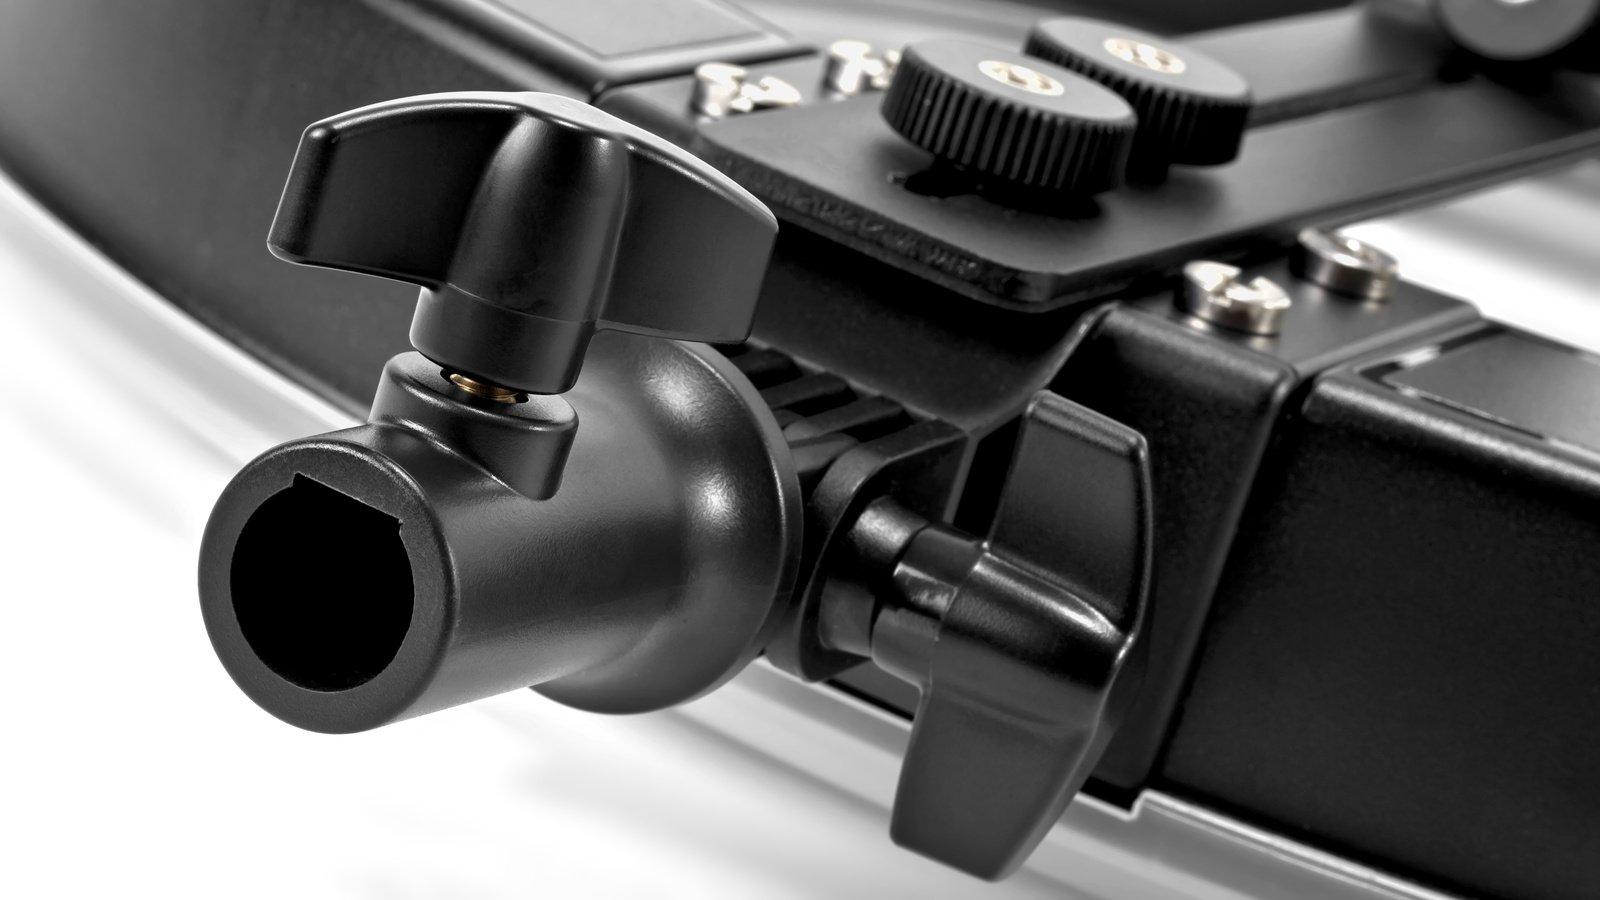 ROKO RL-4500C Bicolor LED Ringleuchte mit Kamerahalterung und Memory Funktion Foto Nr. 10